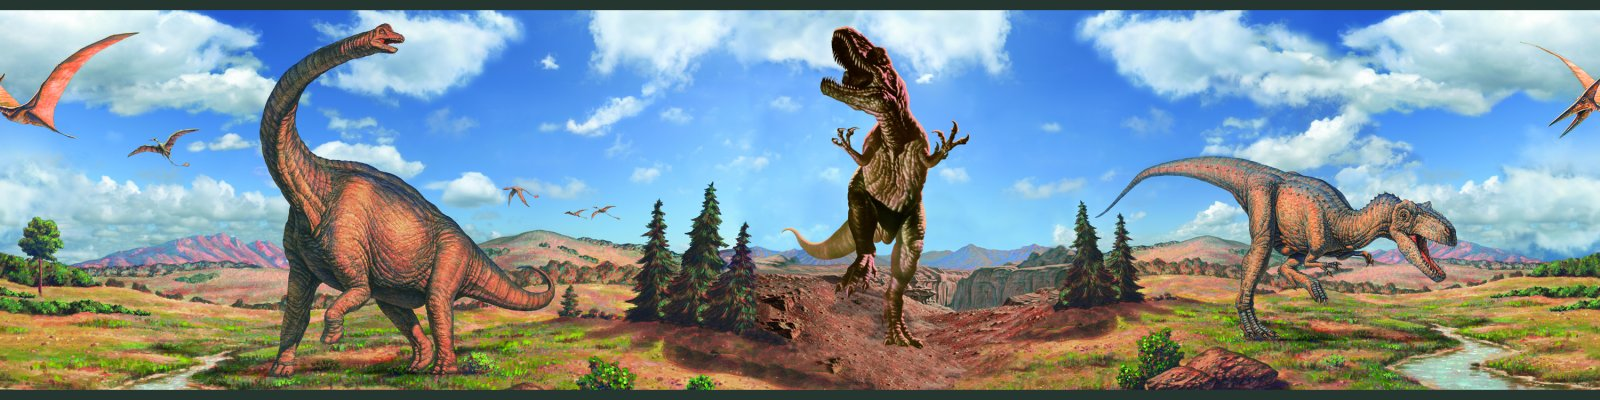 Dinosaur Peel and Stick Kids Wallpaper Border 1600x400